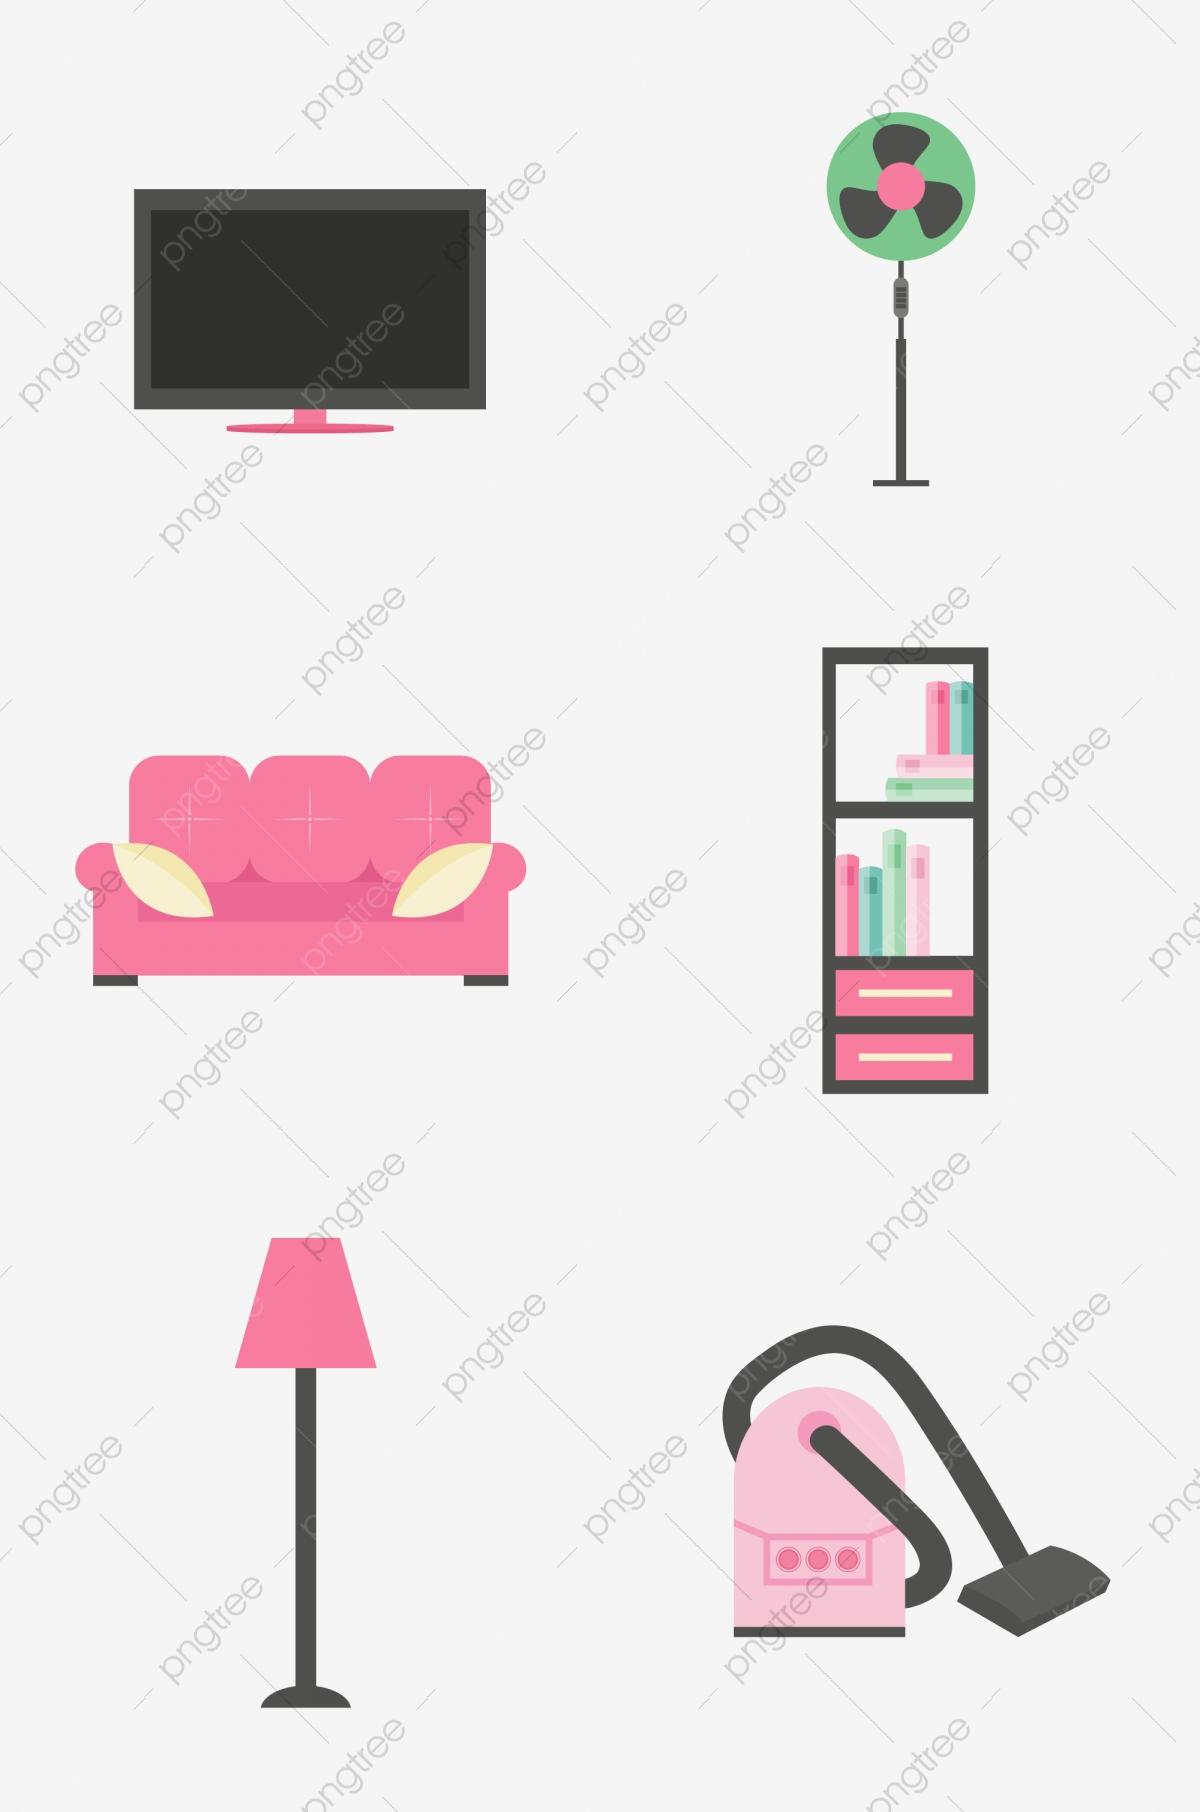 Furniture clipart fan. Prototype home appliance tv